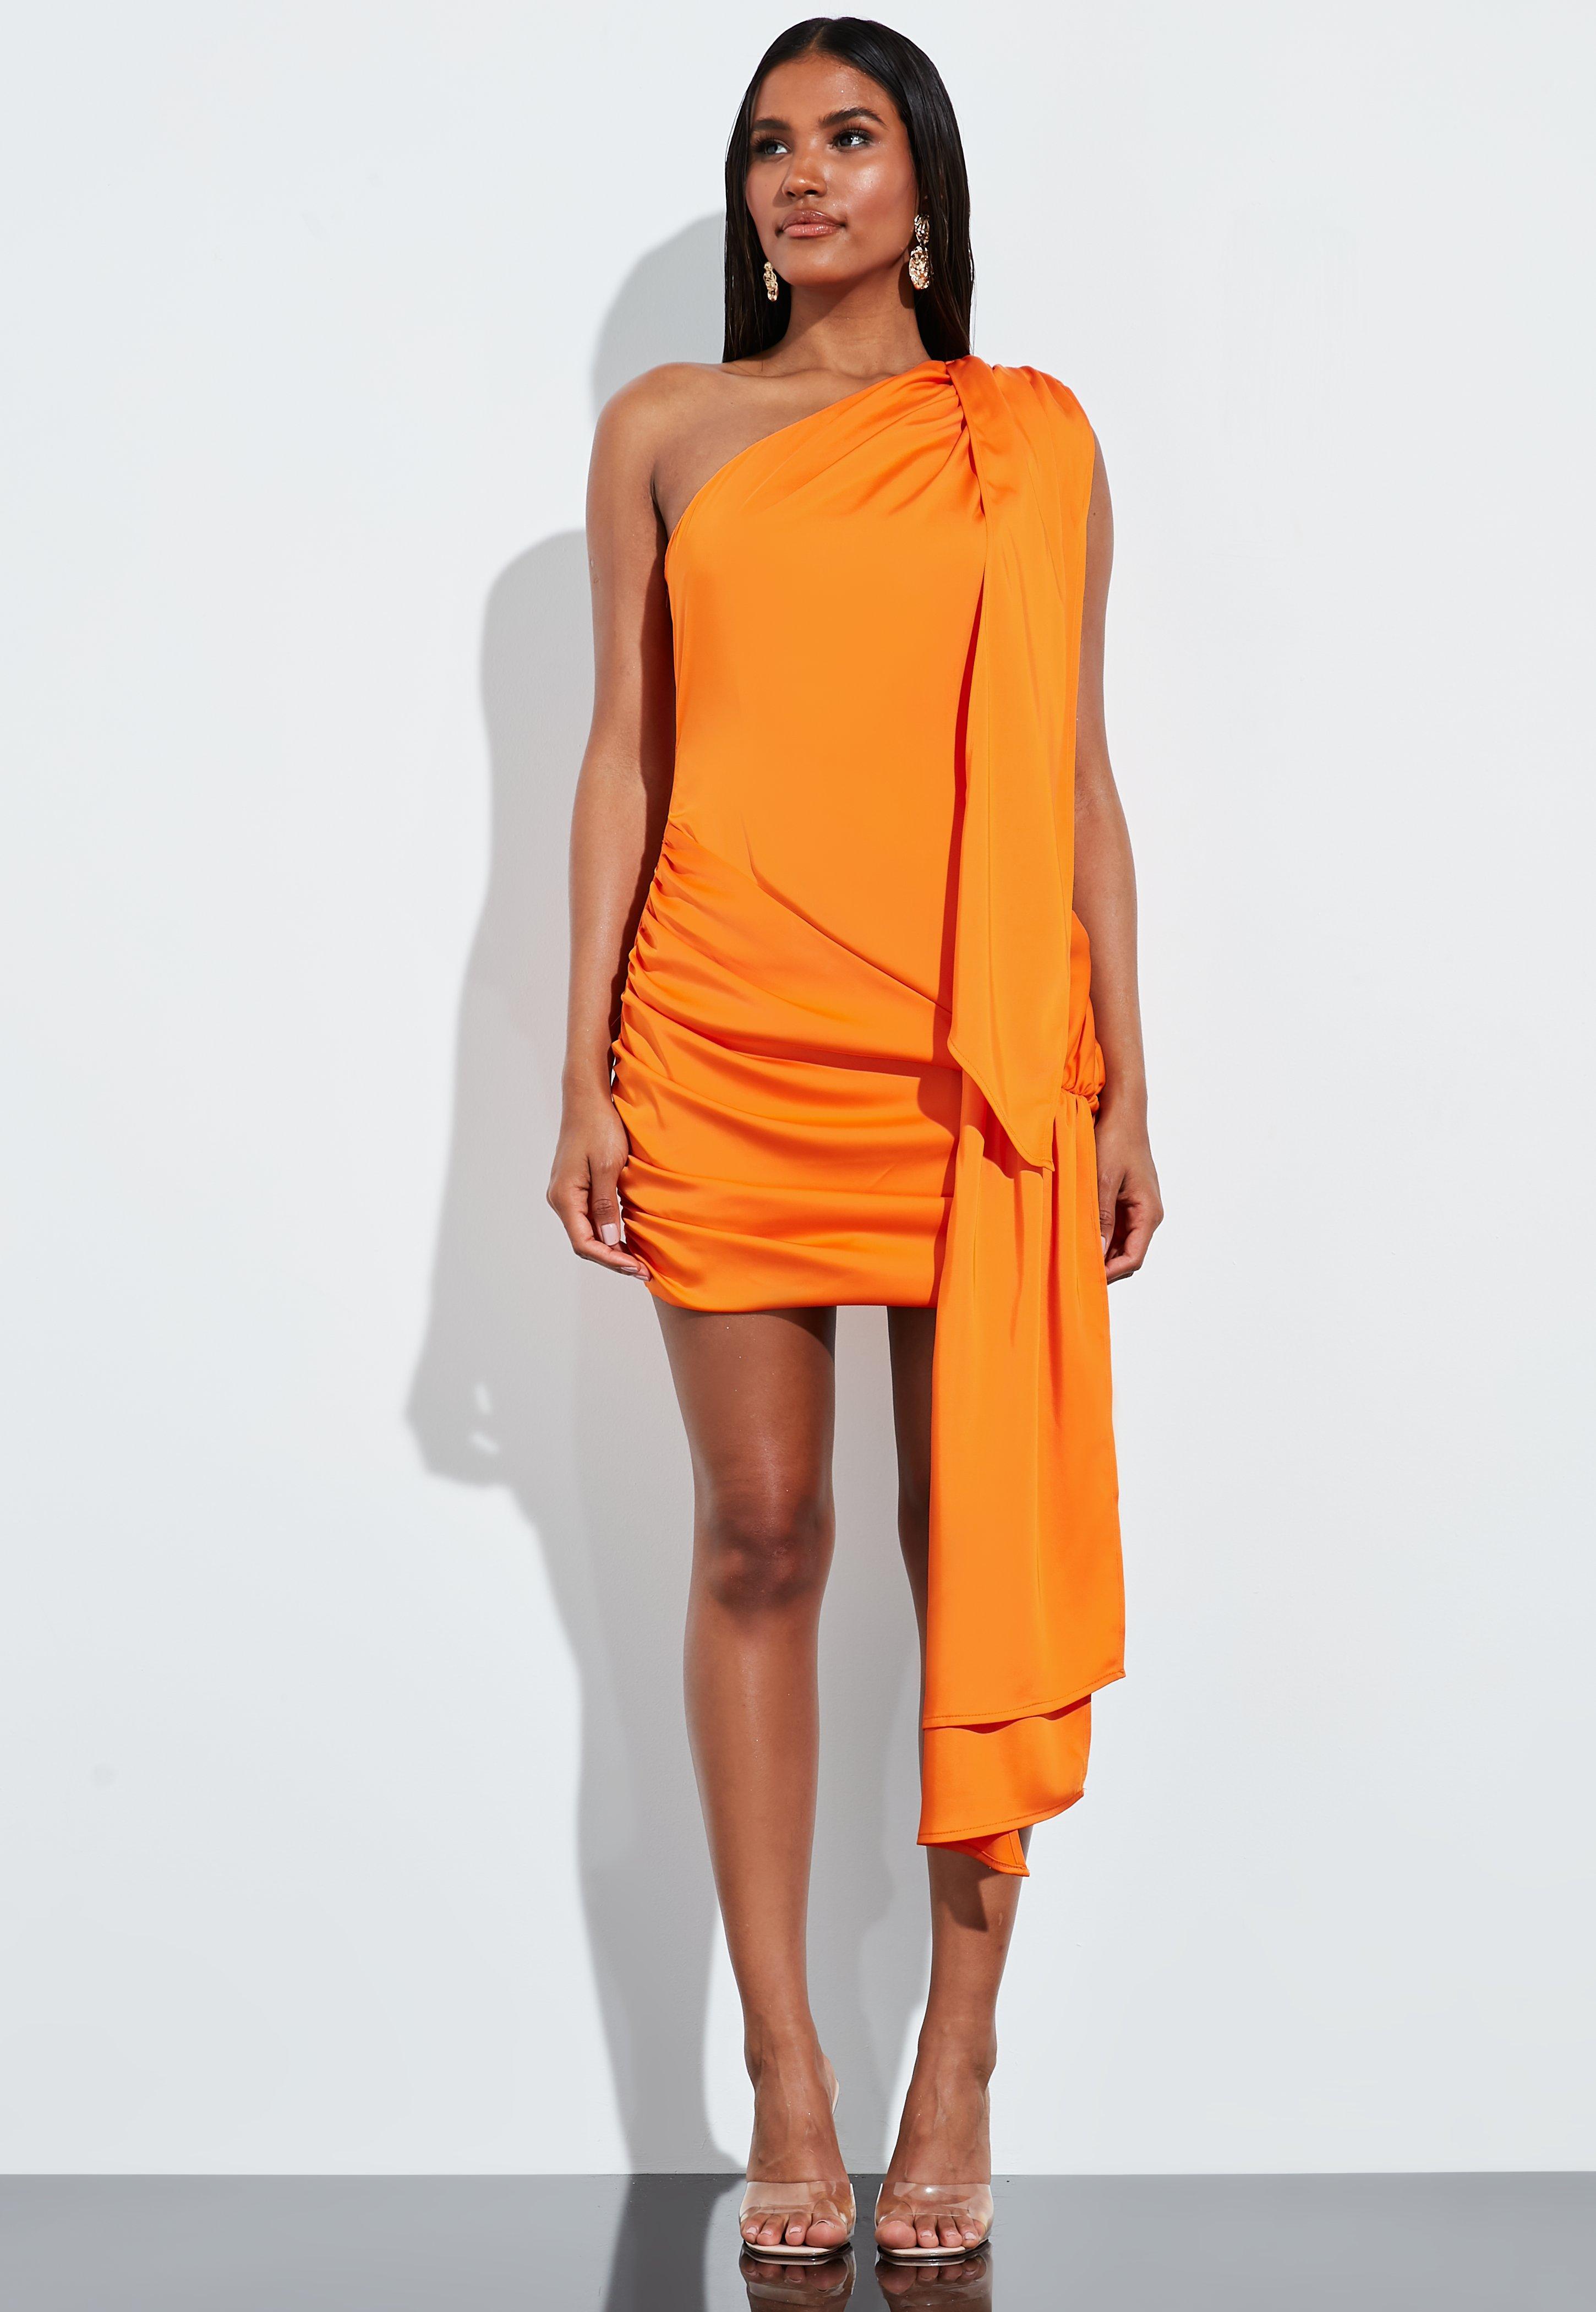 PeaceLove Drapeado Vestido Corto Asimétrico Naranja En De Satén uikPXZ